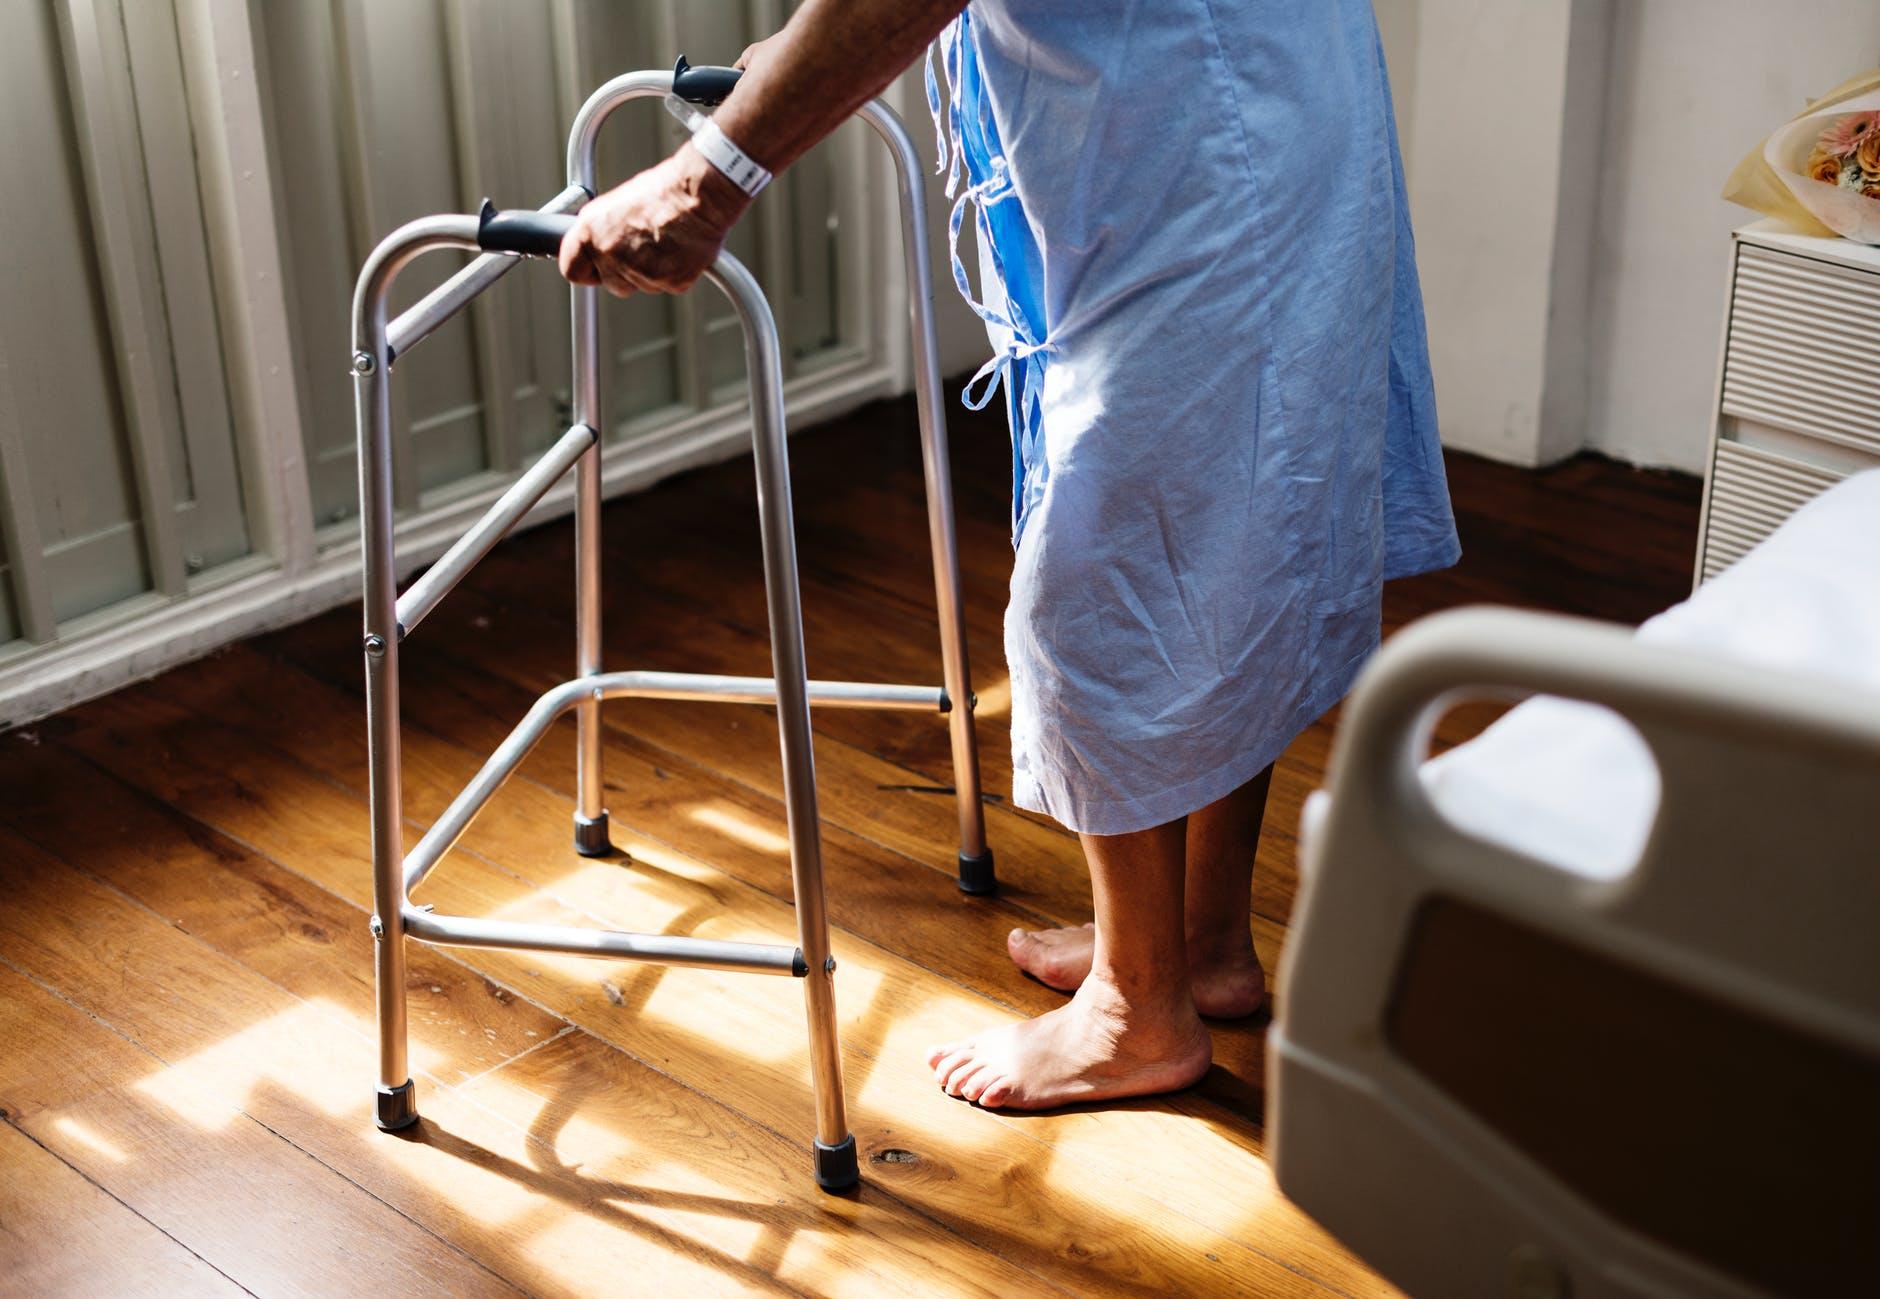 Alternatives to Hospice Care